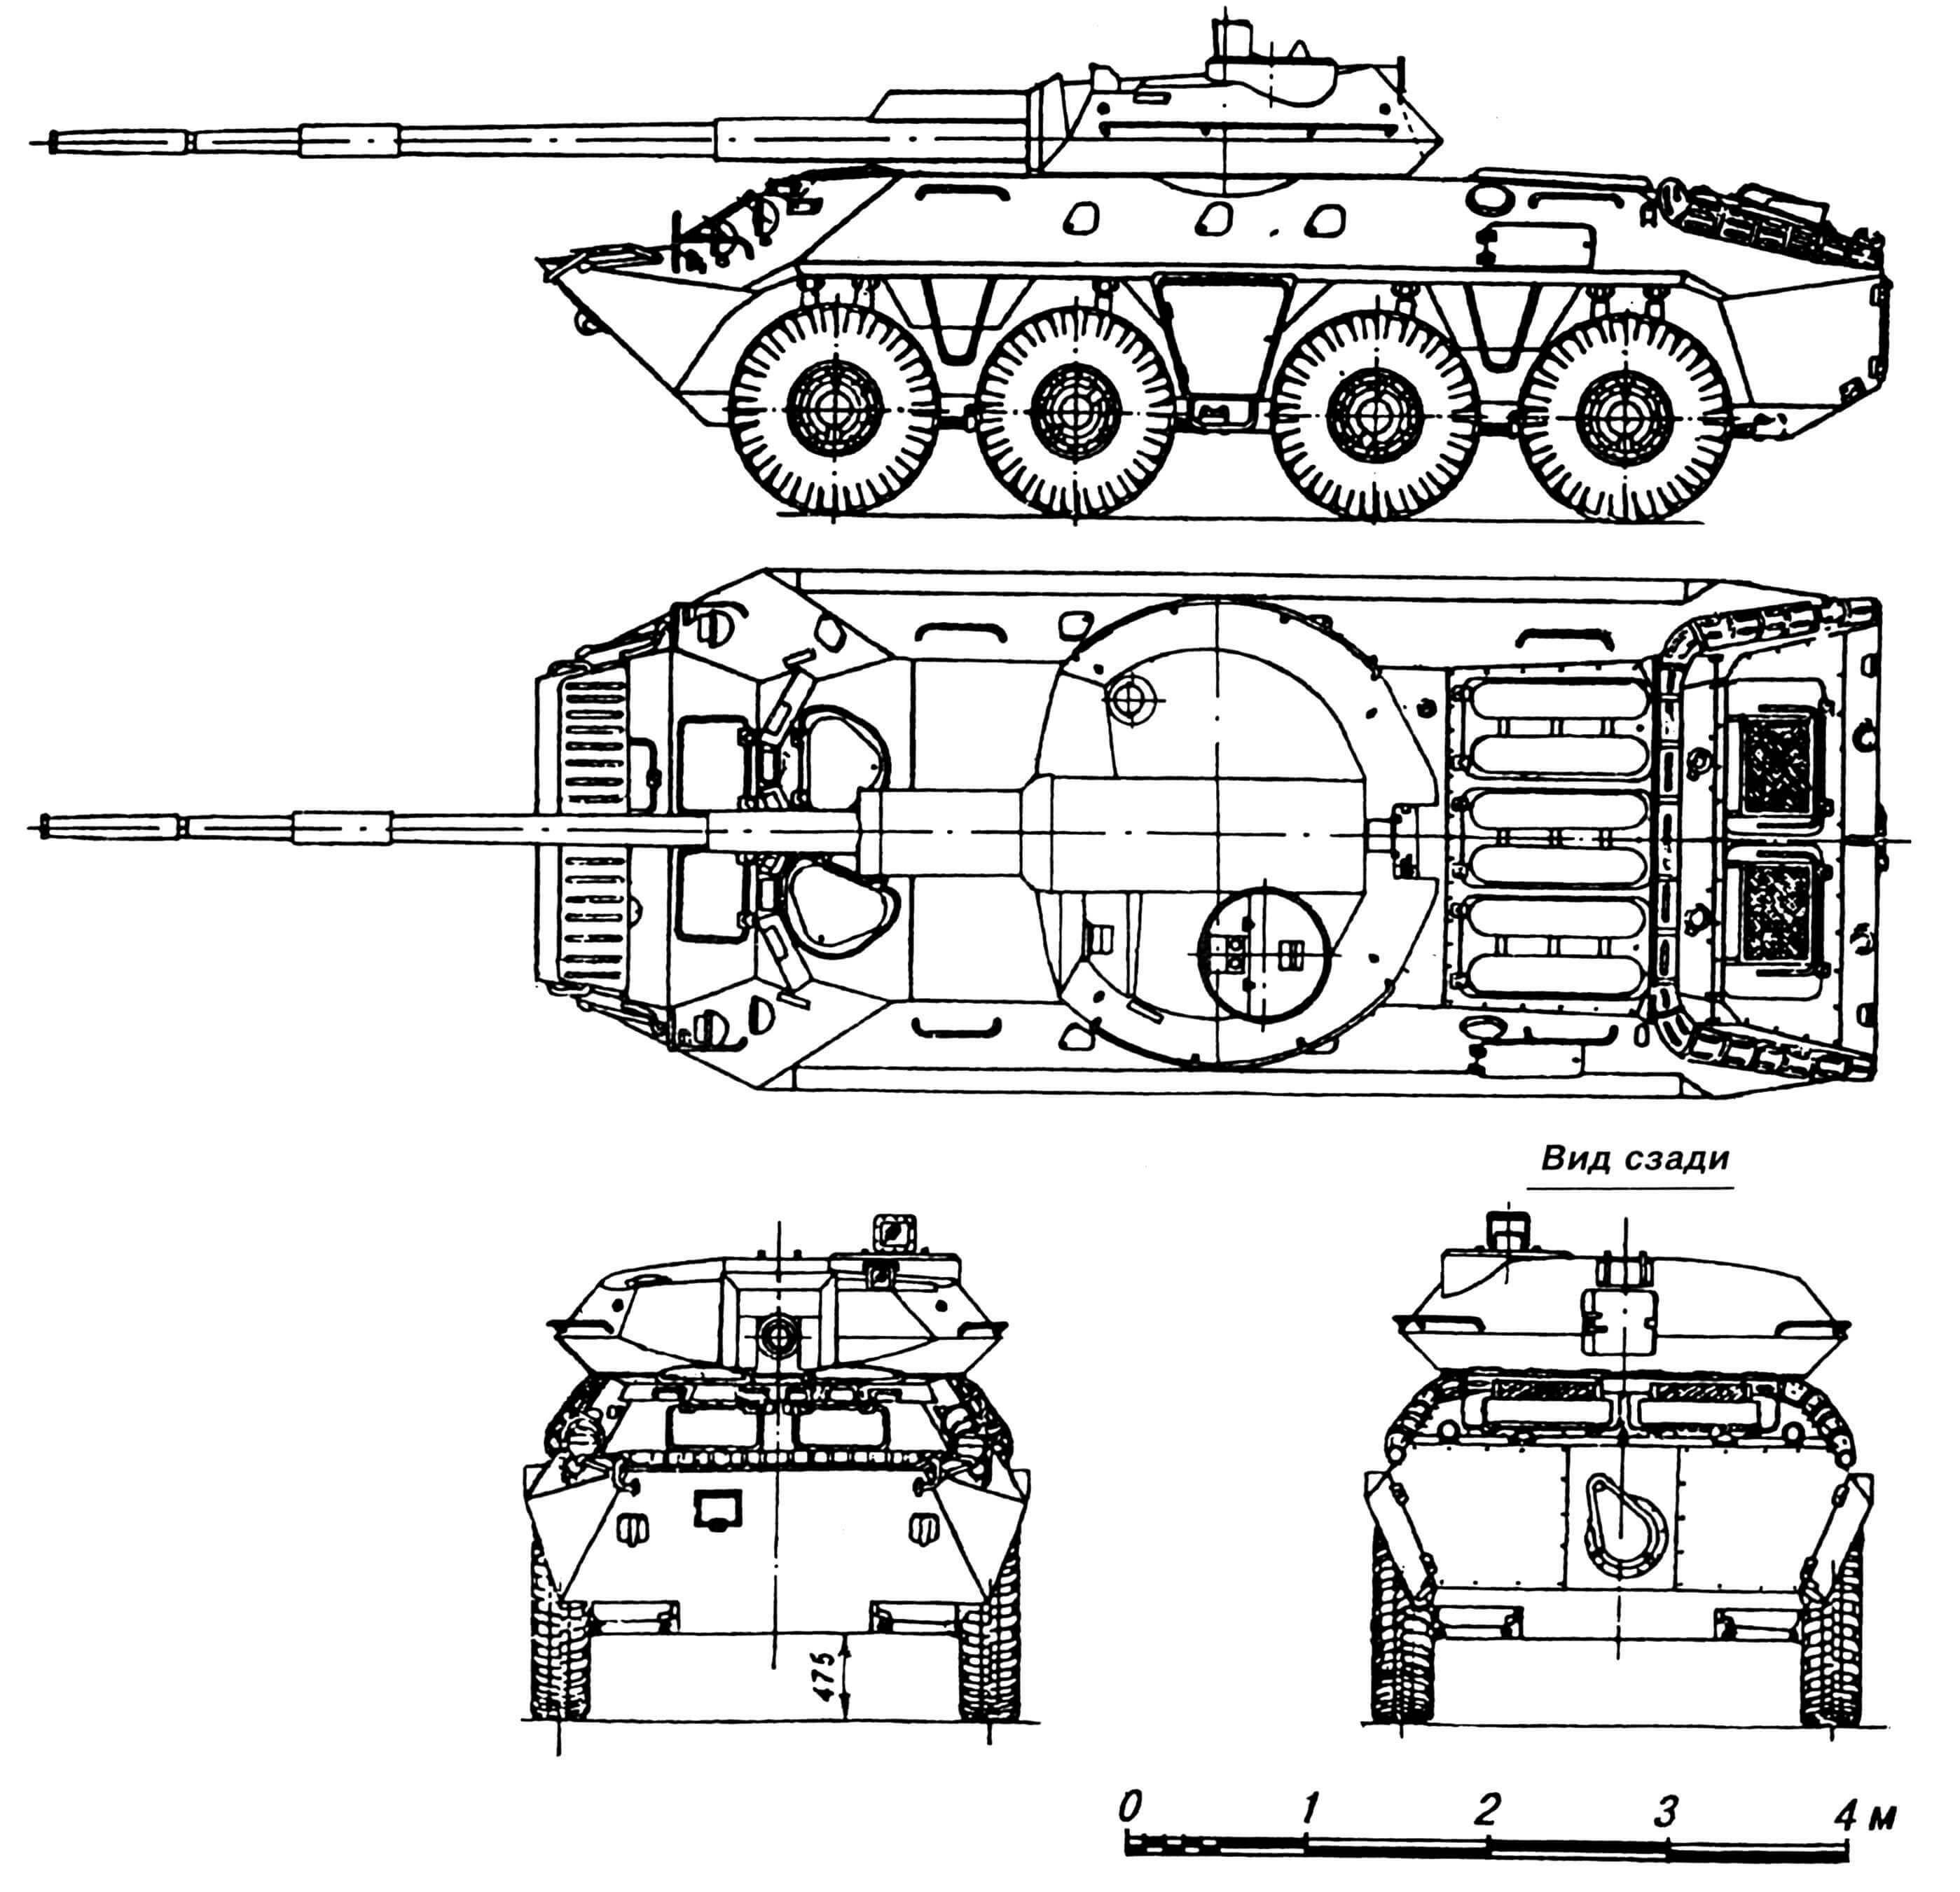 БКМ 2С14 с 85-мм пушкой «Жало».